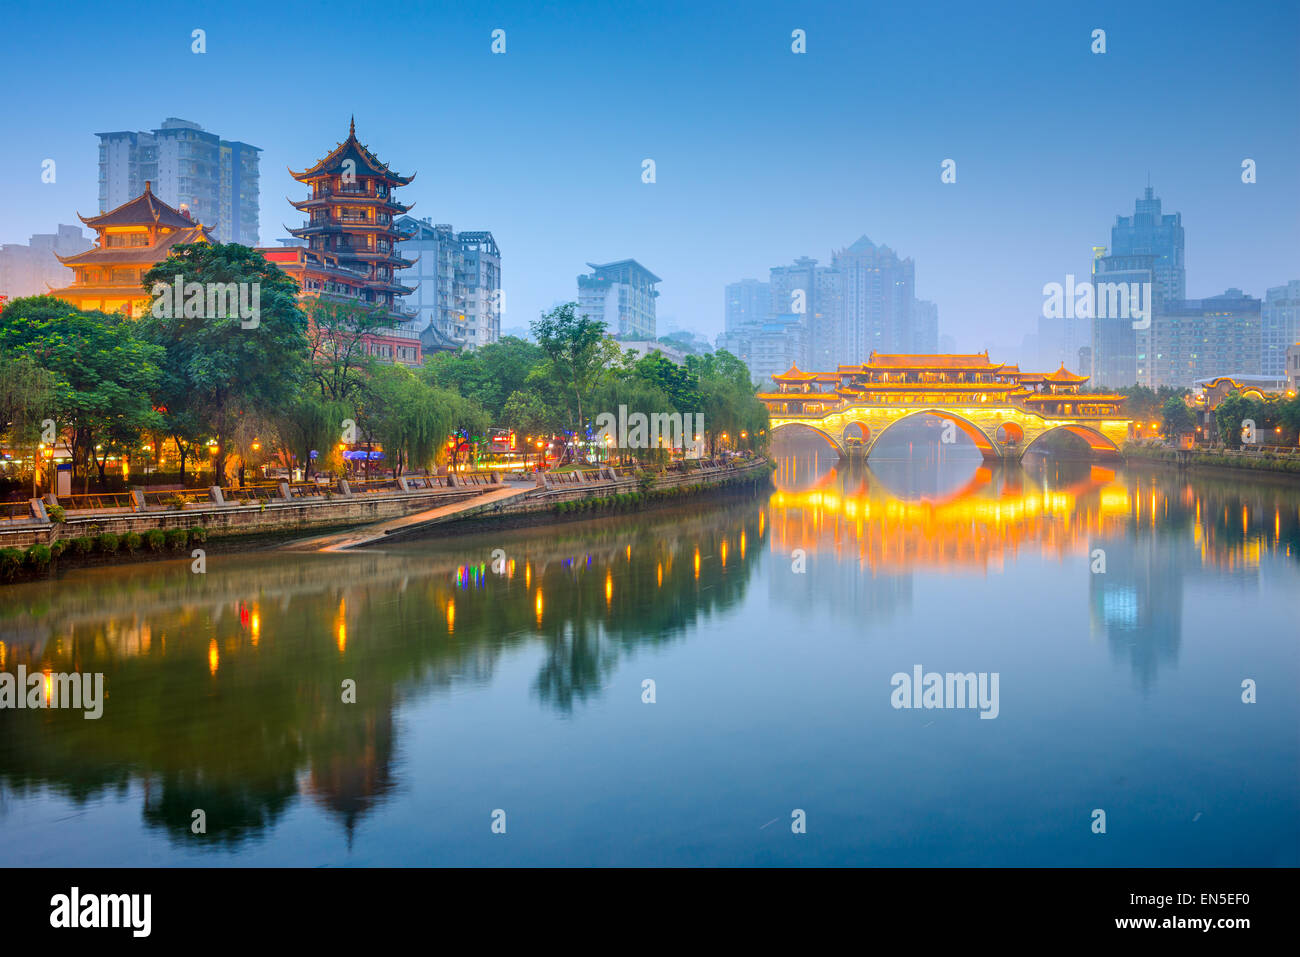 Chengdu, China city skyline on the Jin River with Anshun Bridge. - Stock Image